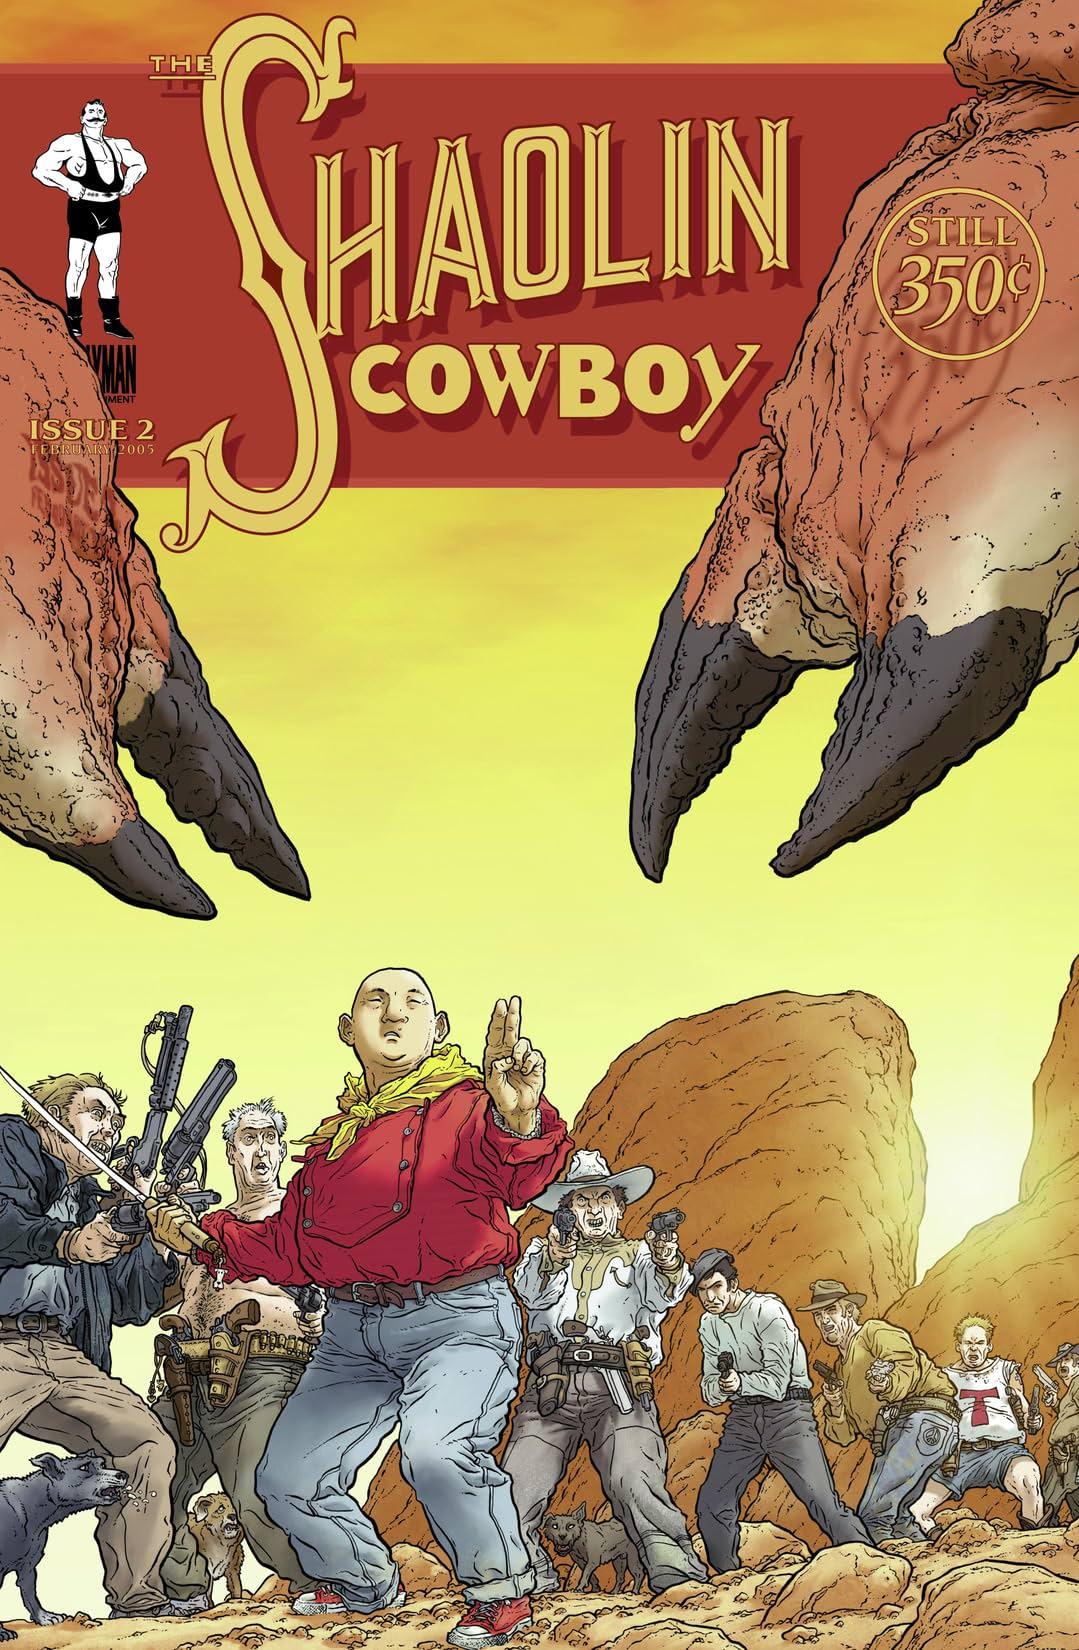 The Shaolin Cowboy #2